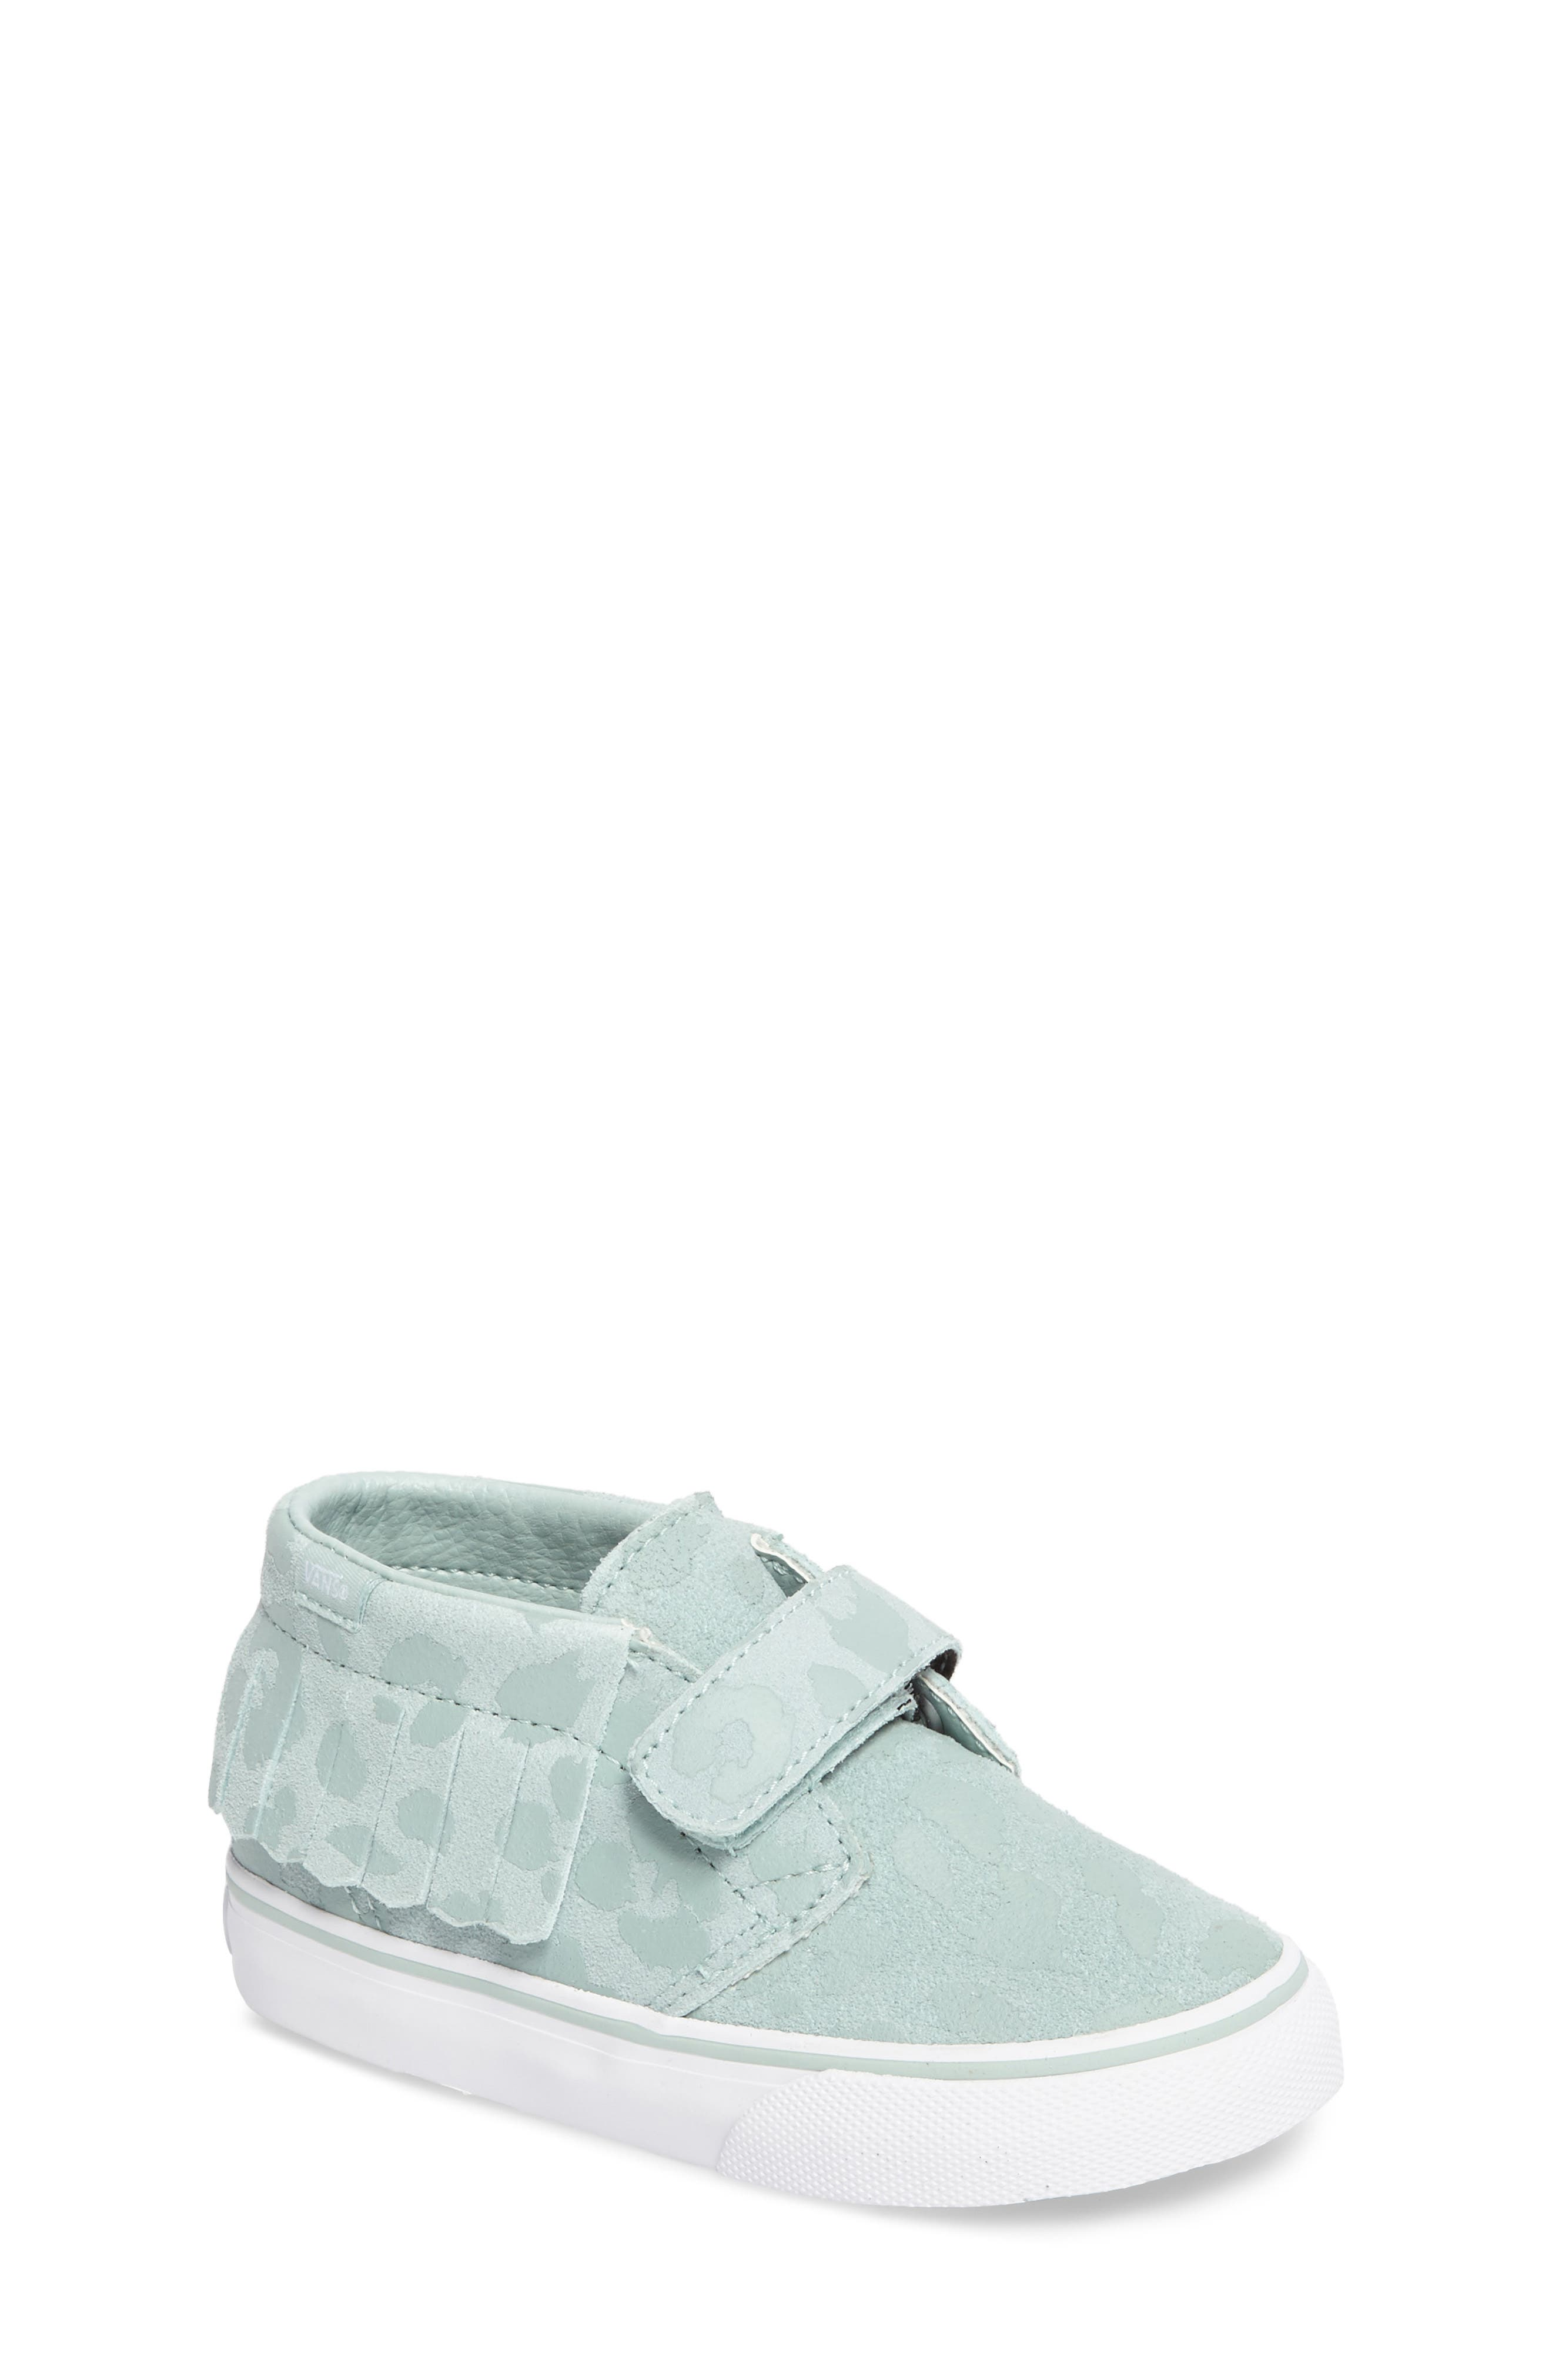 Chukka V Moc Sneaker,                             Main thumbnail 1, color,                             Harbor Gray Leopard Suede